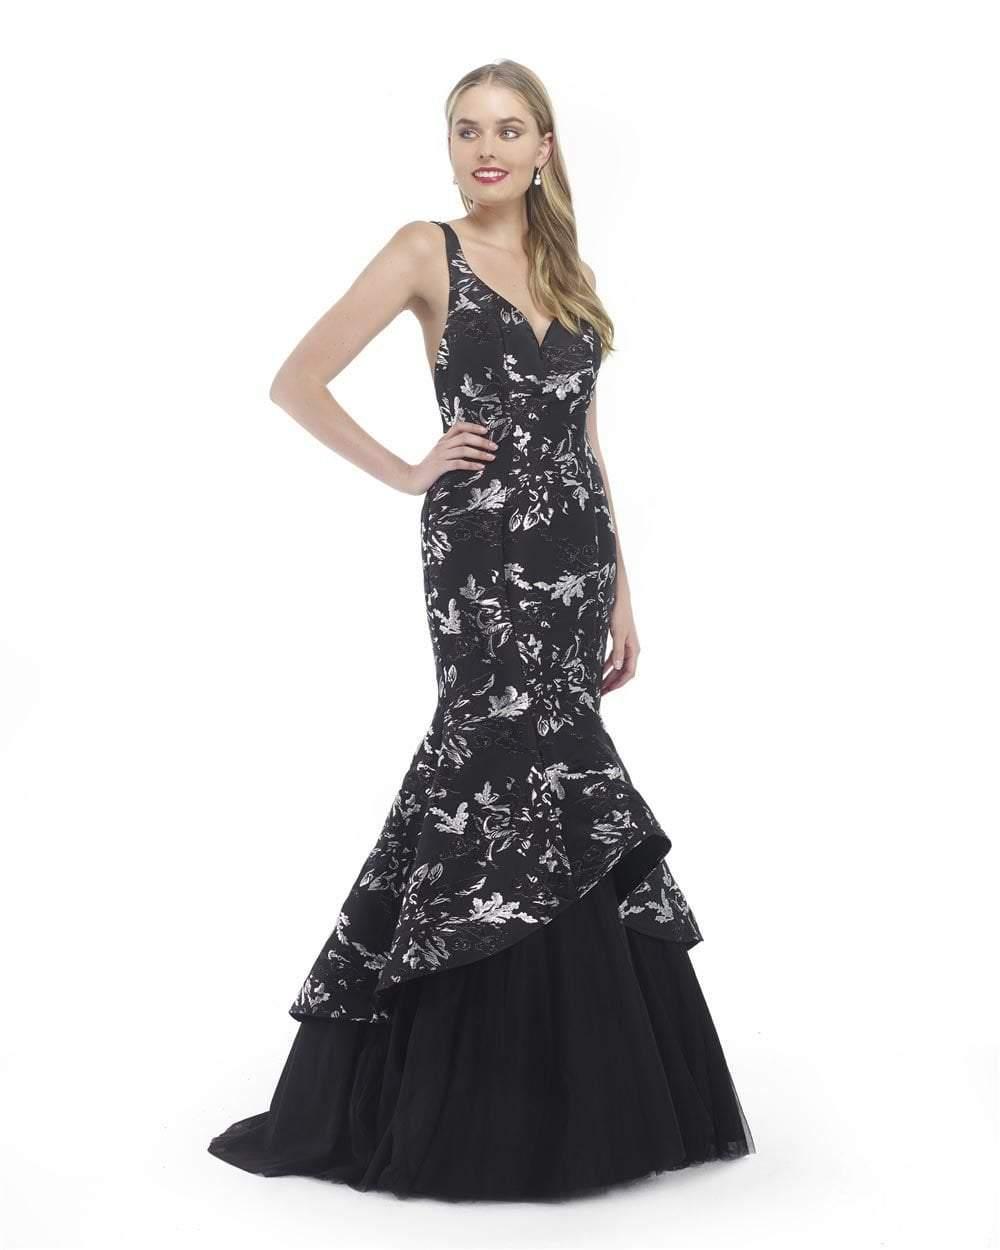 Morrell Maxie - 15818 Sleeveless Metallic Jacquard Mermaid Gown